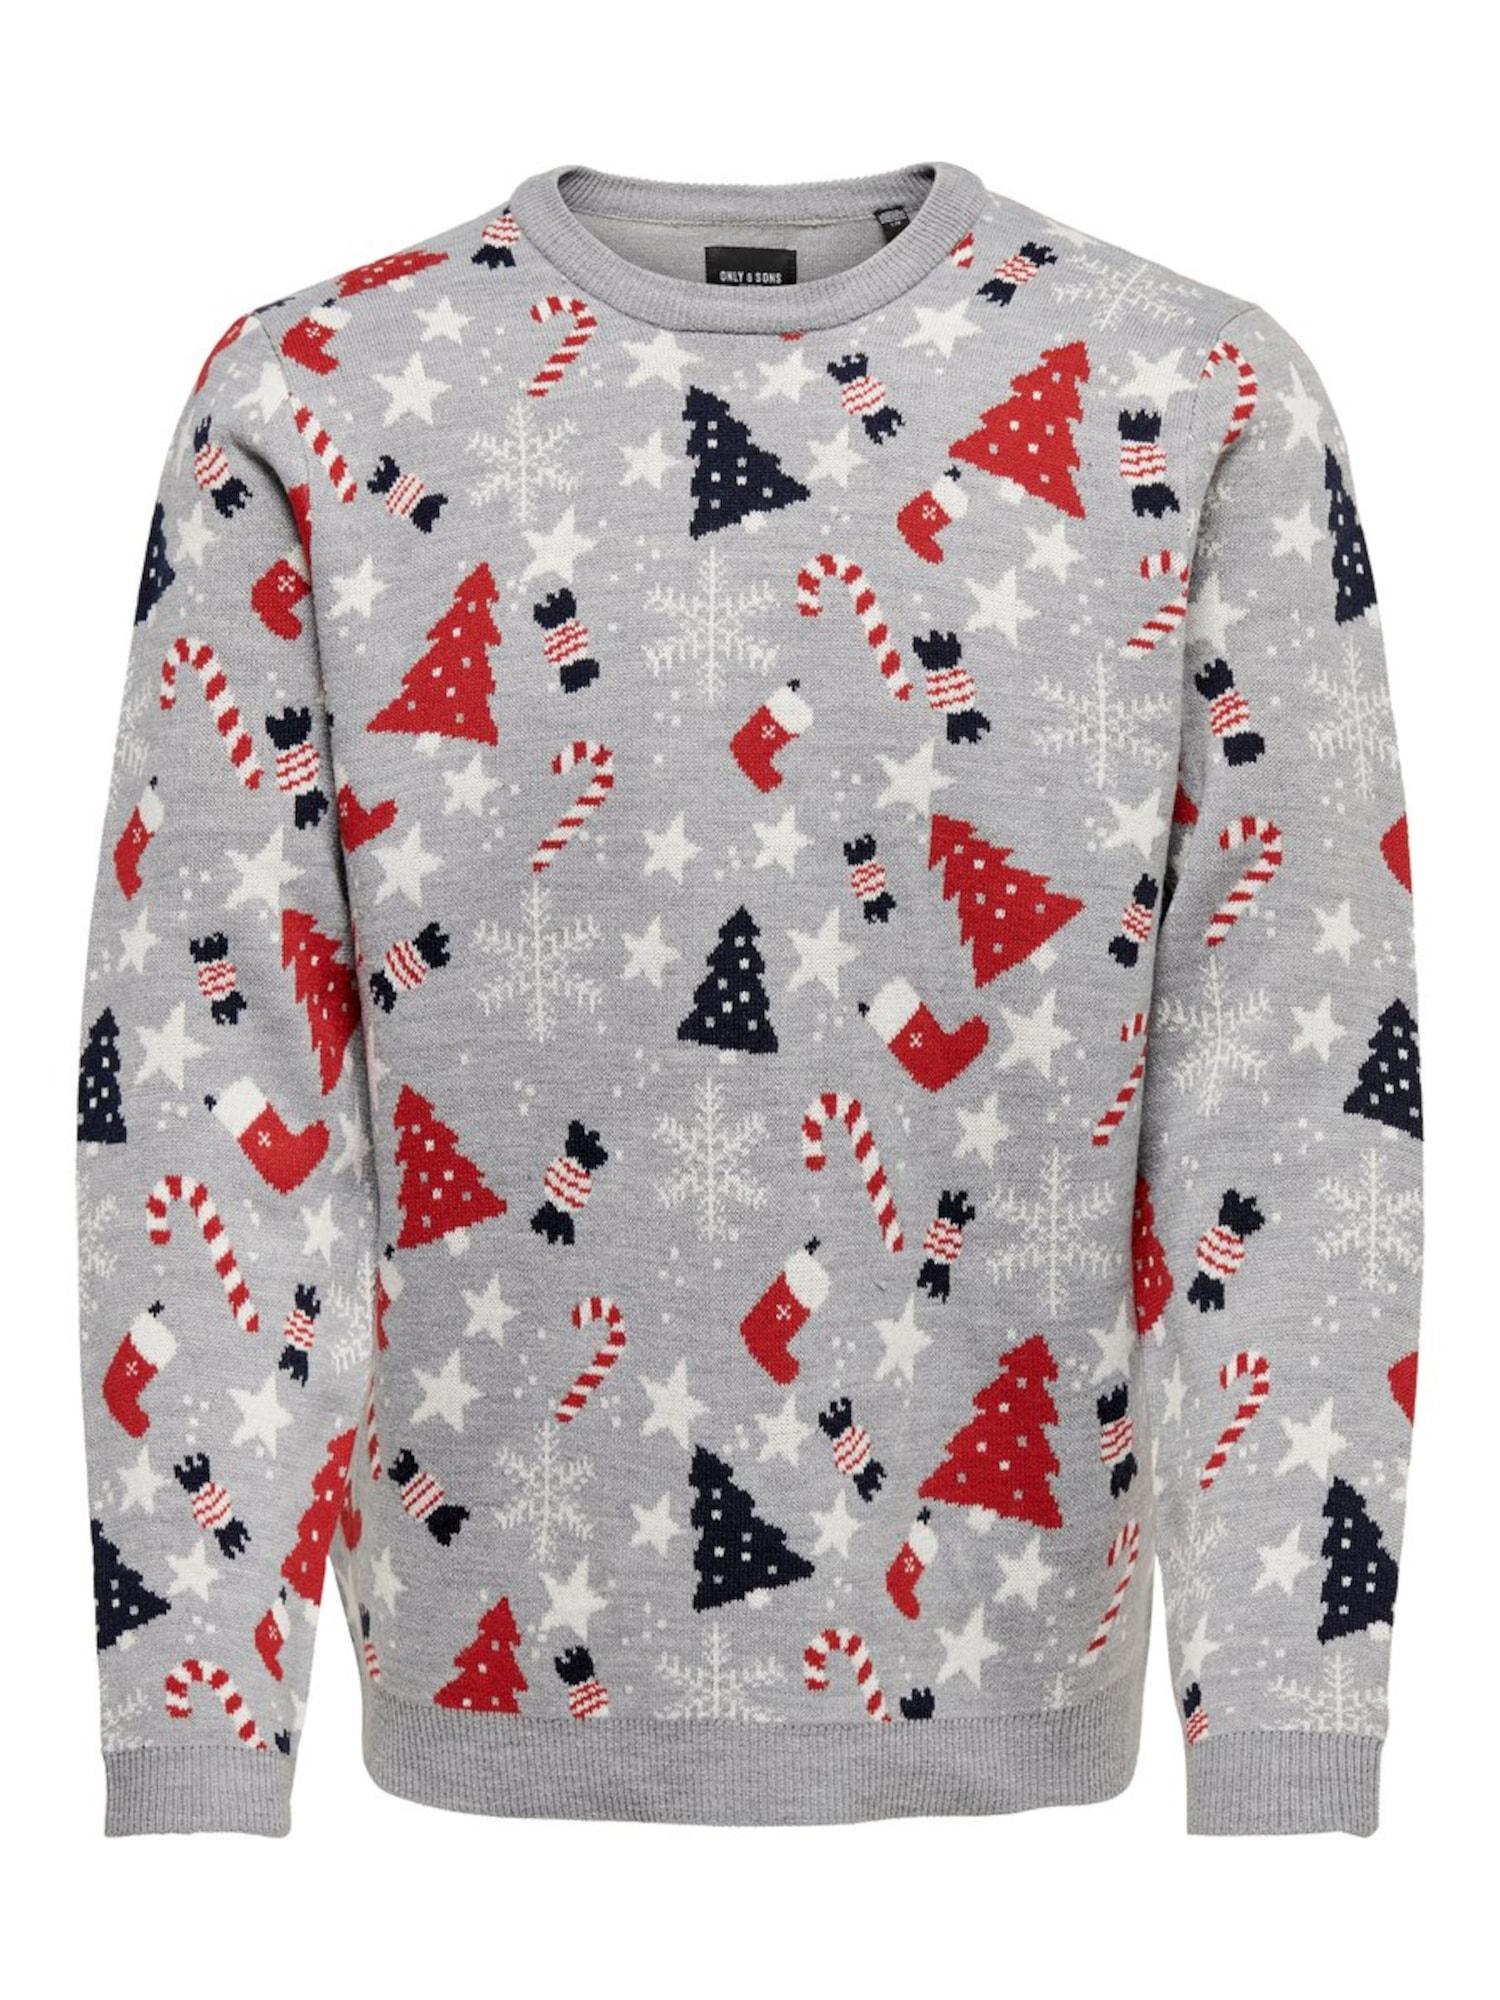 Only & Sons Megztinis 'Christmas' mišrios spalvos / margai pilka